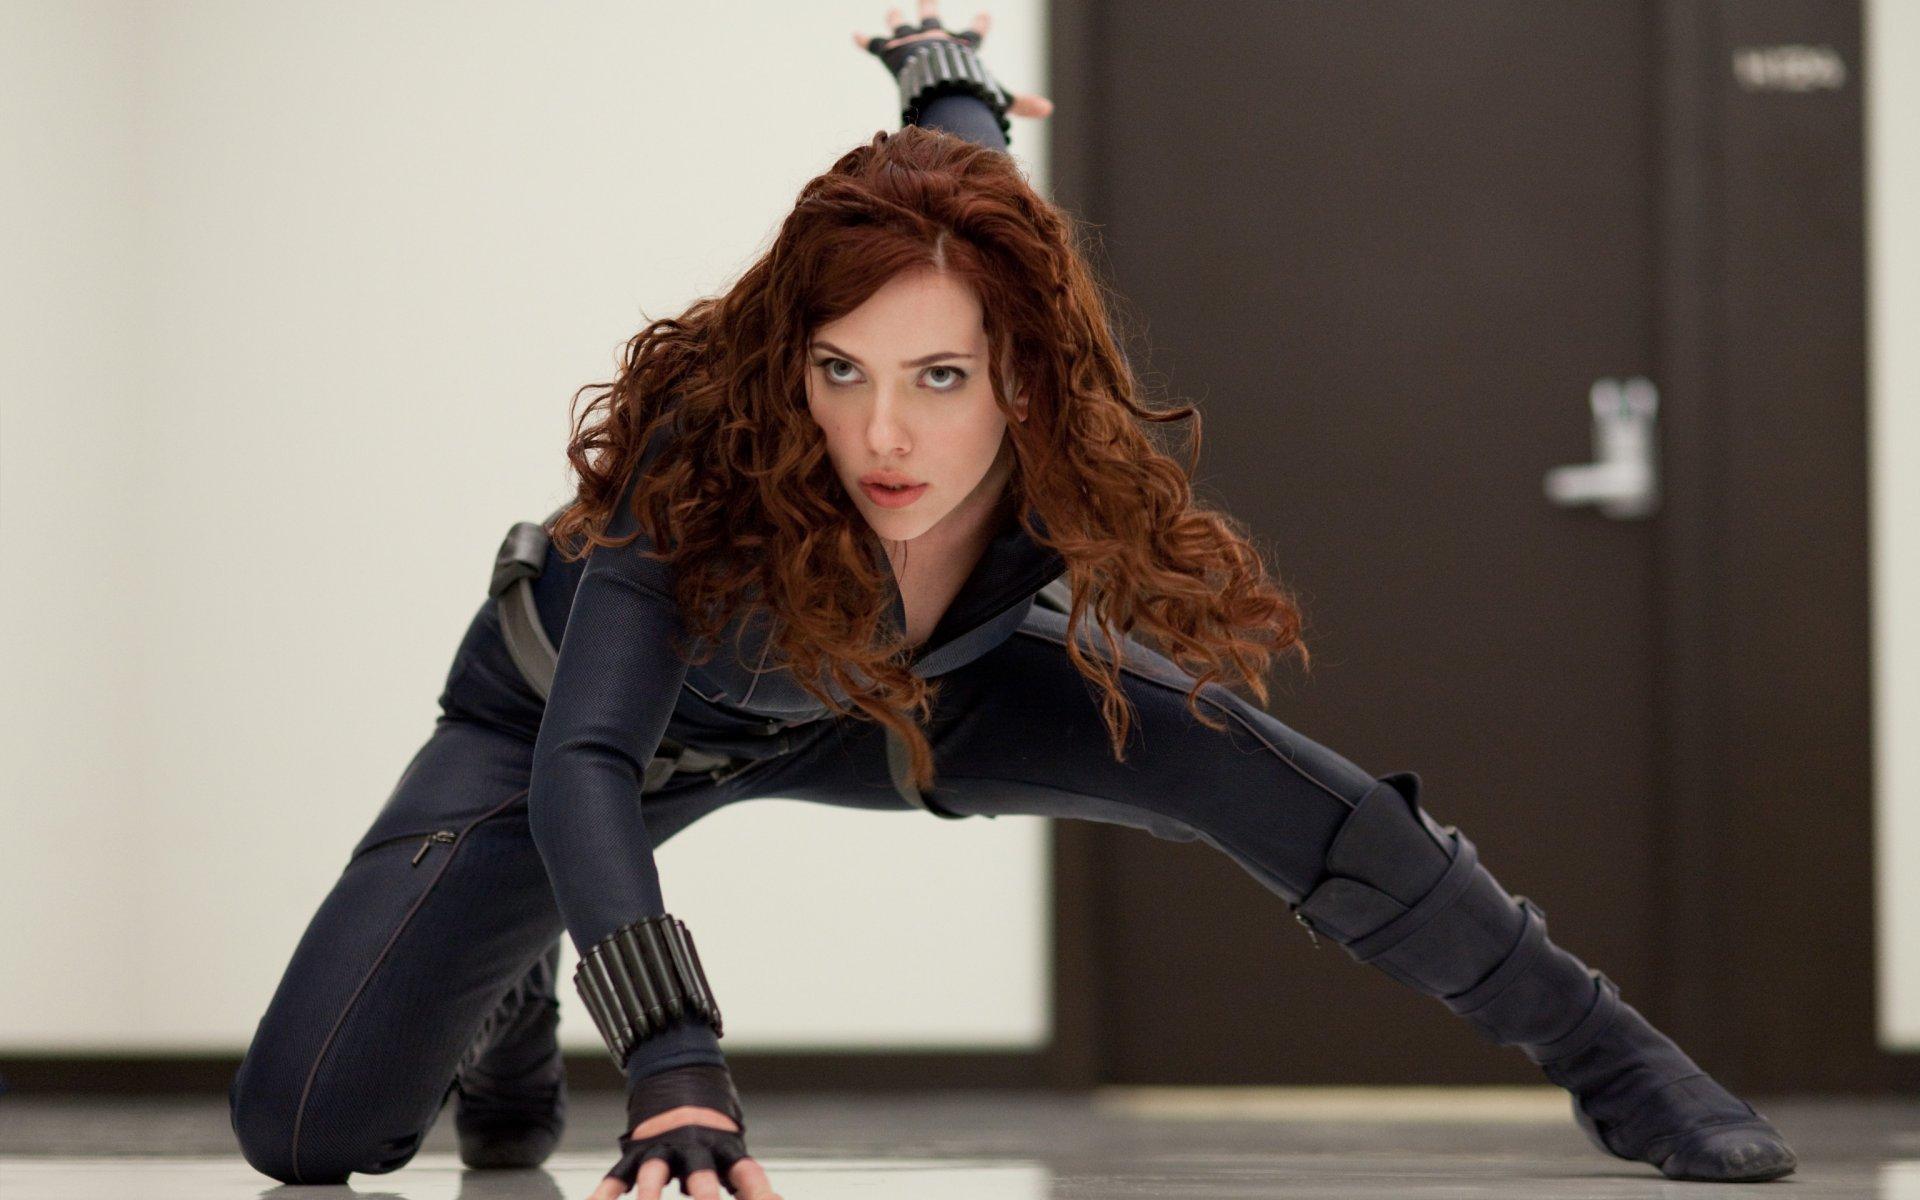 Iron Man 2 Black Widow Wallpaper - Iron Man 2 Black Widow